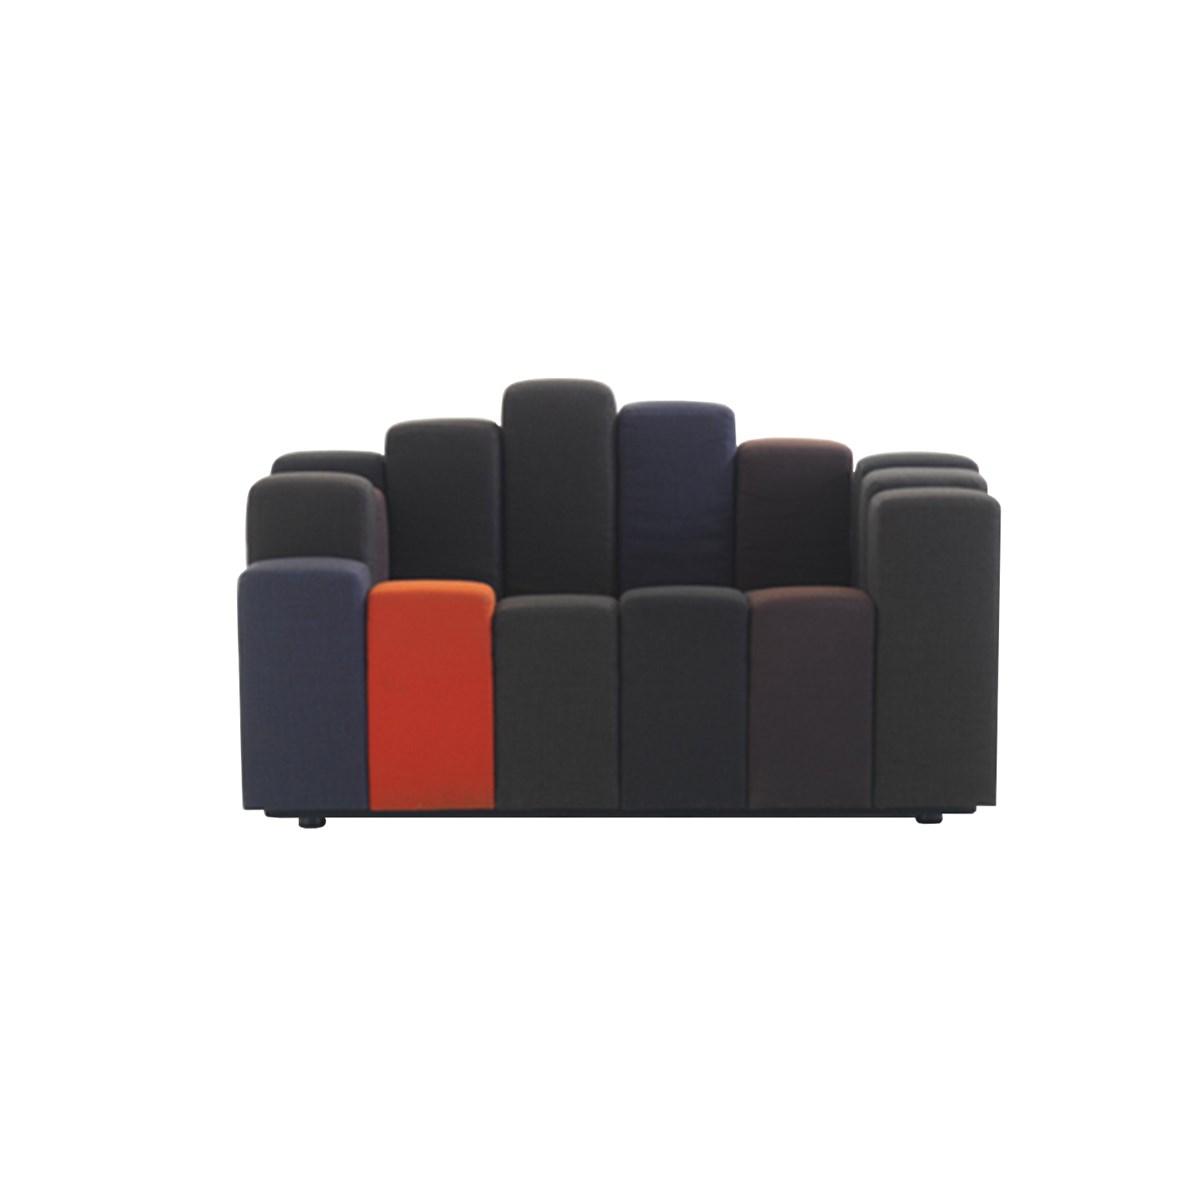 Moroso-Ron-Arad-Do-Lo-Rez-Sofa-Matisse-1